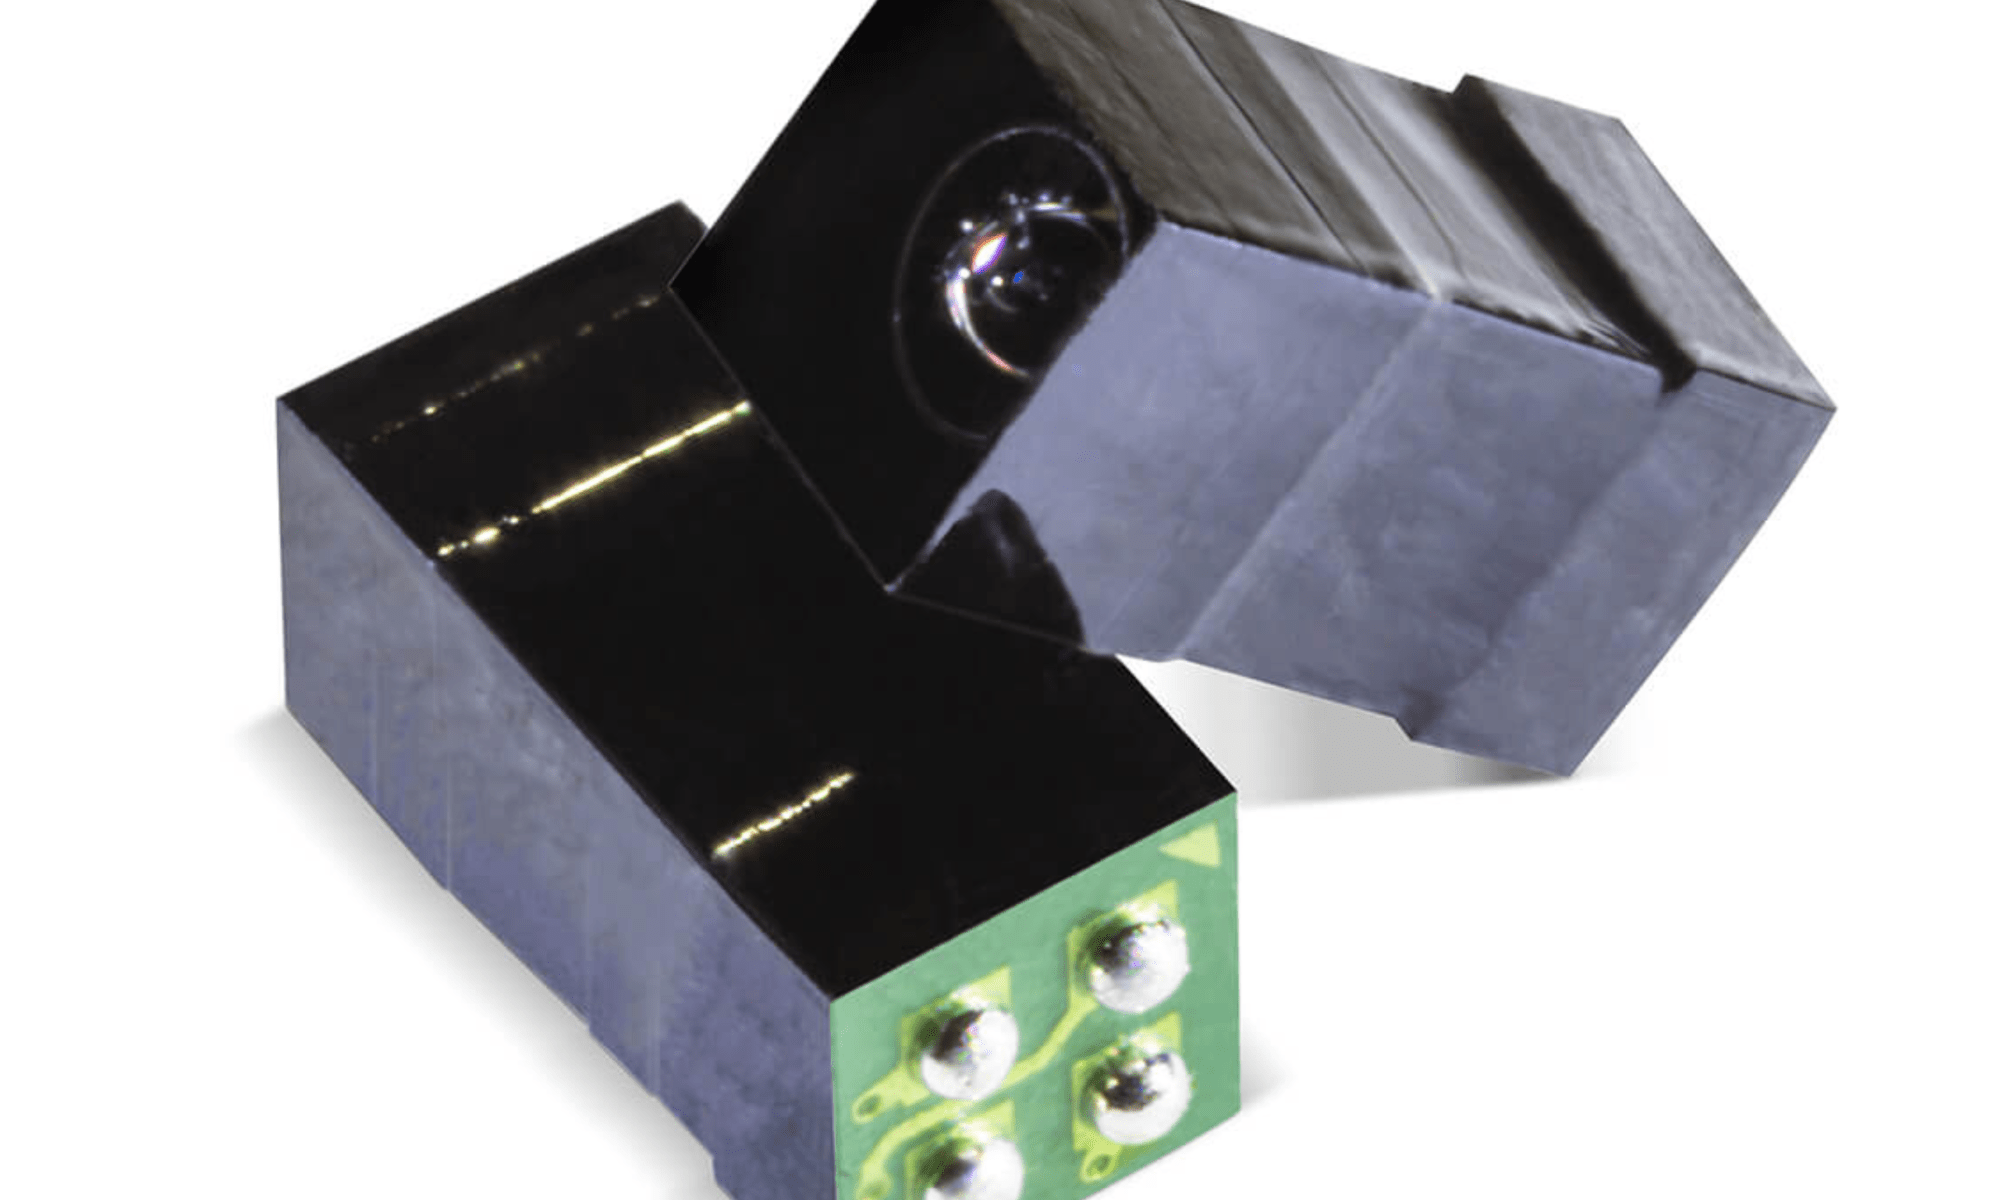 NanoVision and NanoBerry evaluation kits